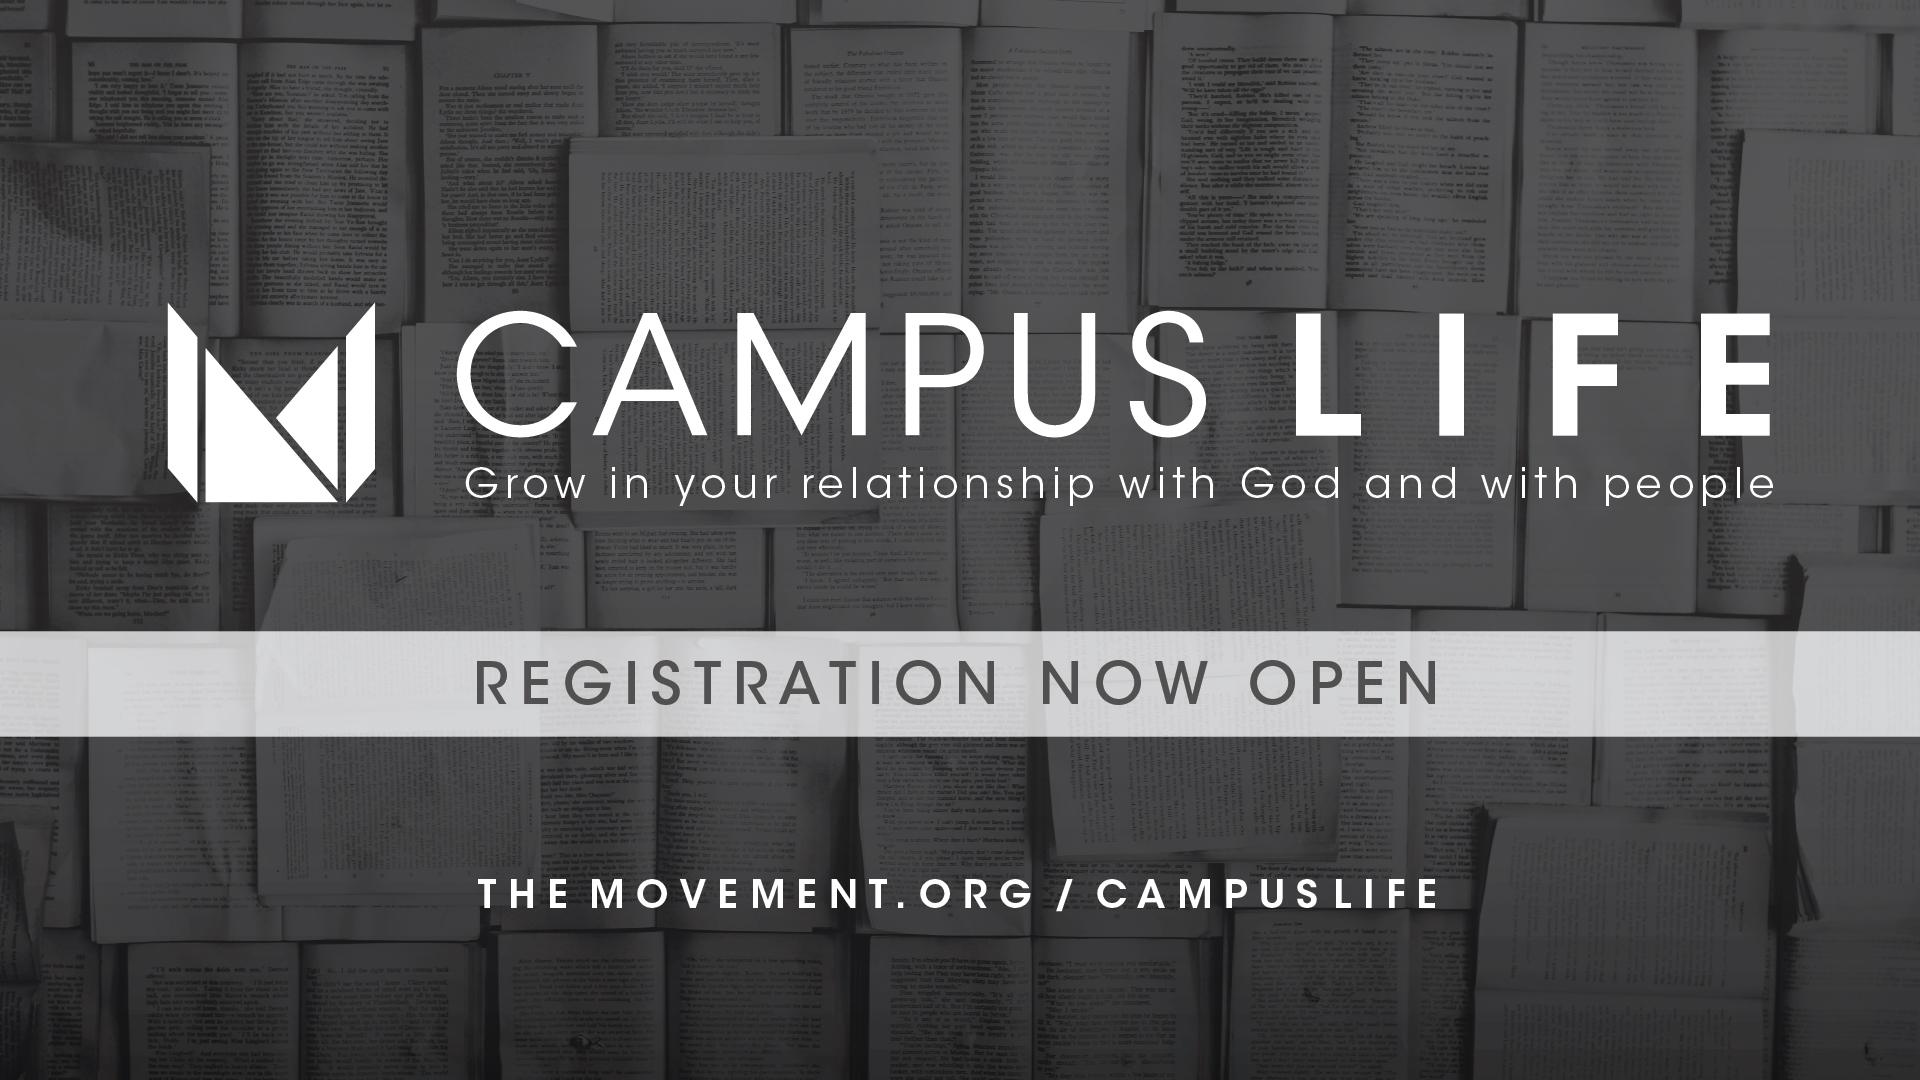 Campus_Life_registrationopen.jpg